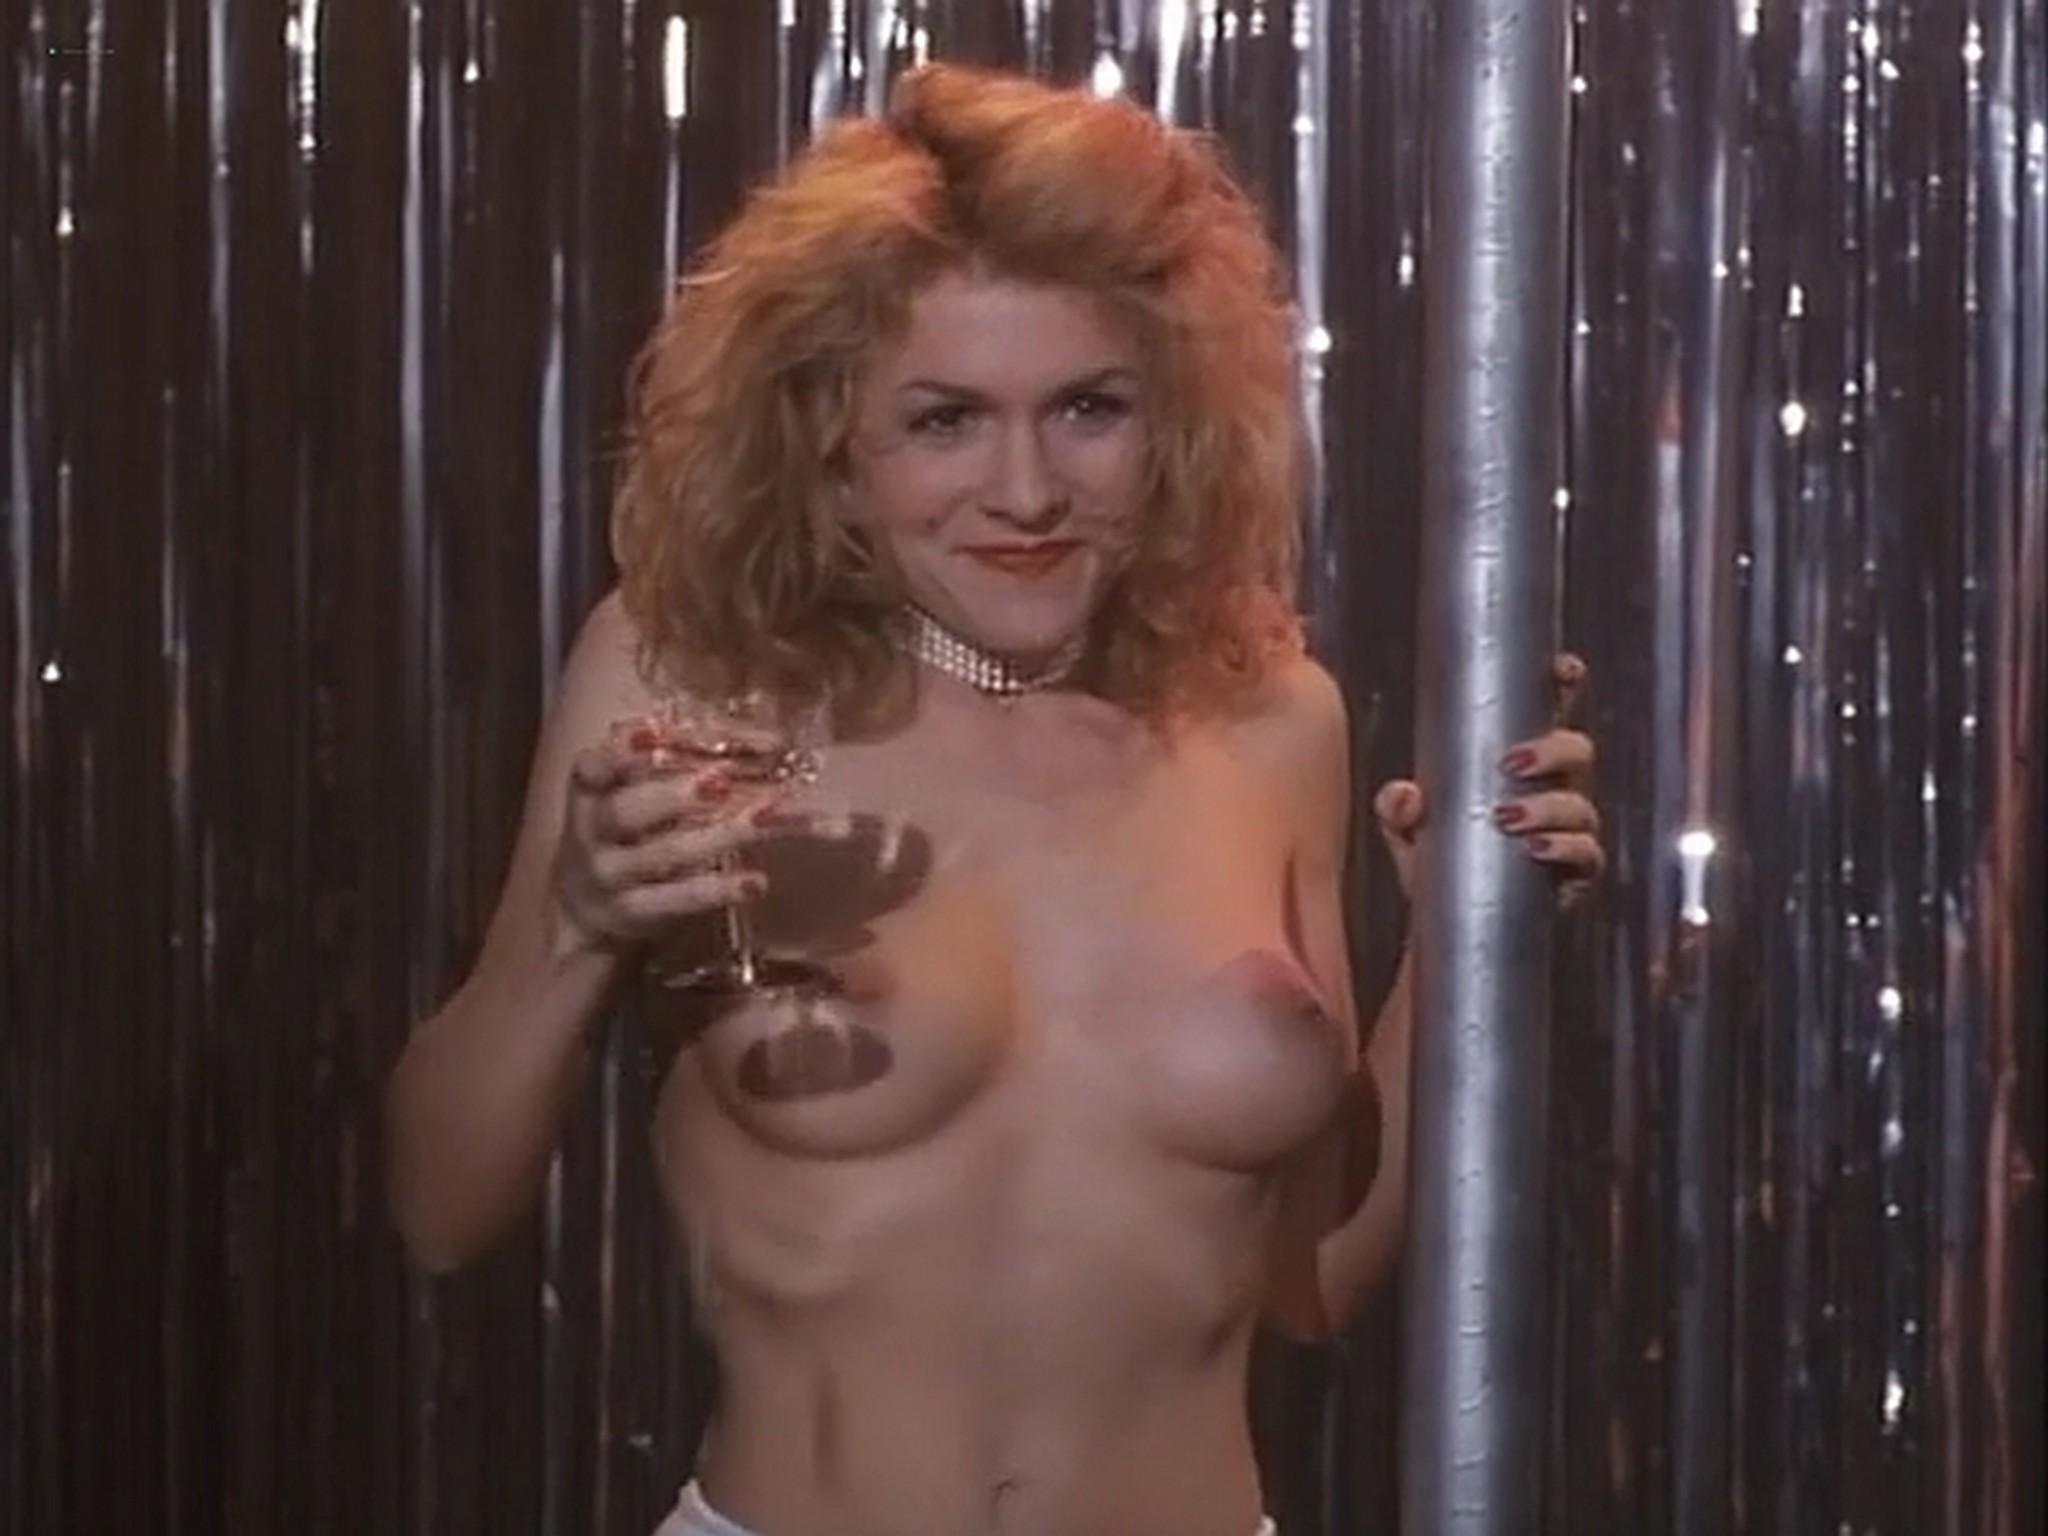 Barbara Alyn Woods nude Catya Sassoon Jill Pierce nude too as strippers Dance with Death 1991 17